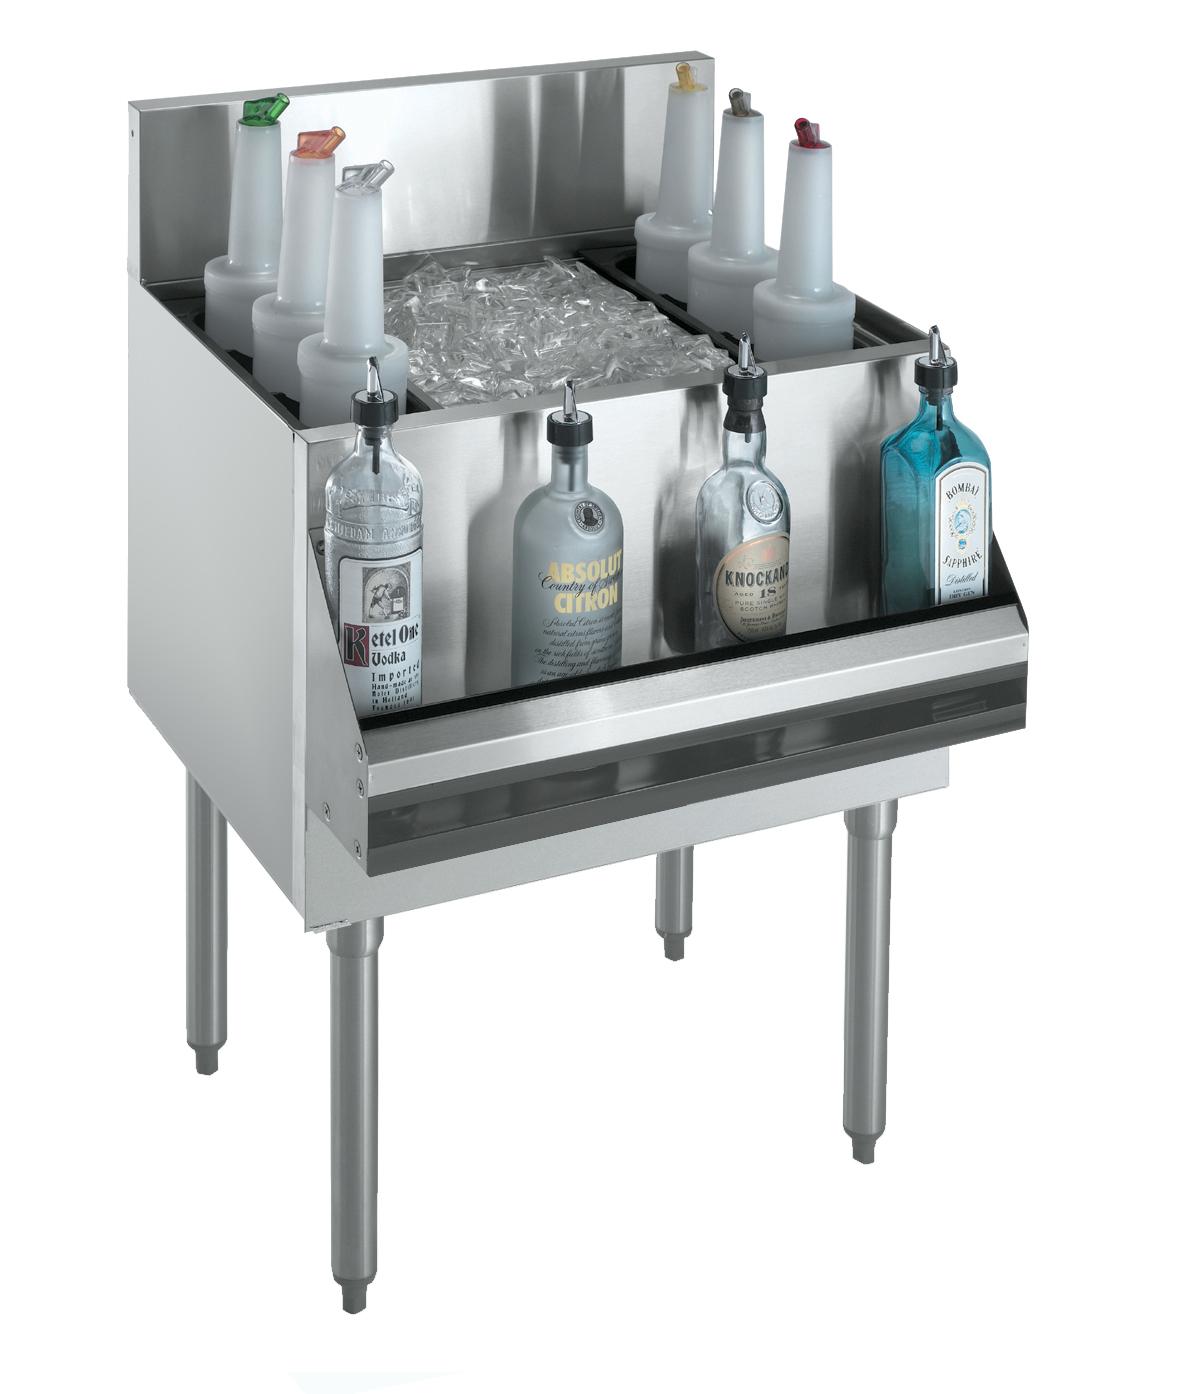 Krowne Metal KR18-30 underbar ice bin/cocktail unit